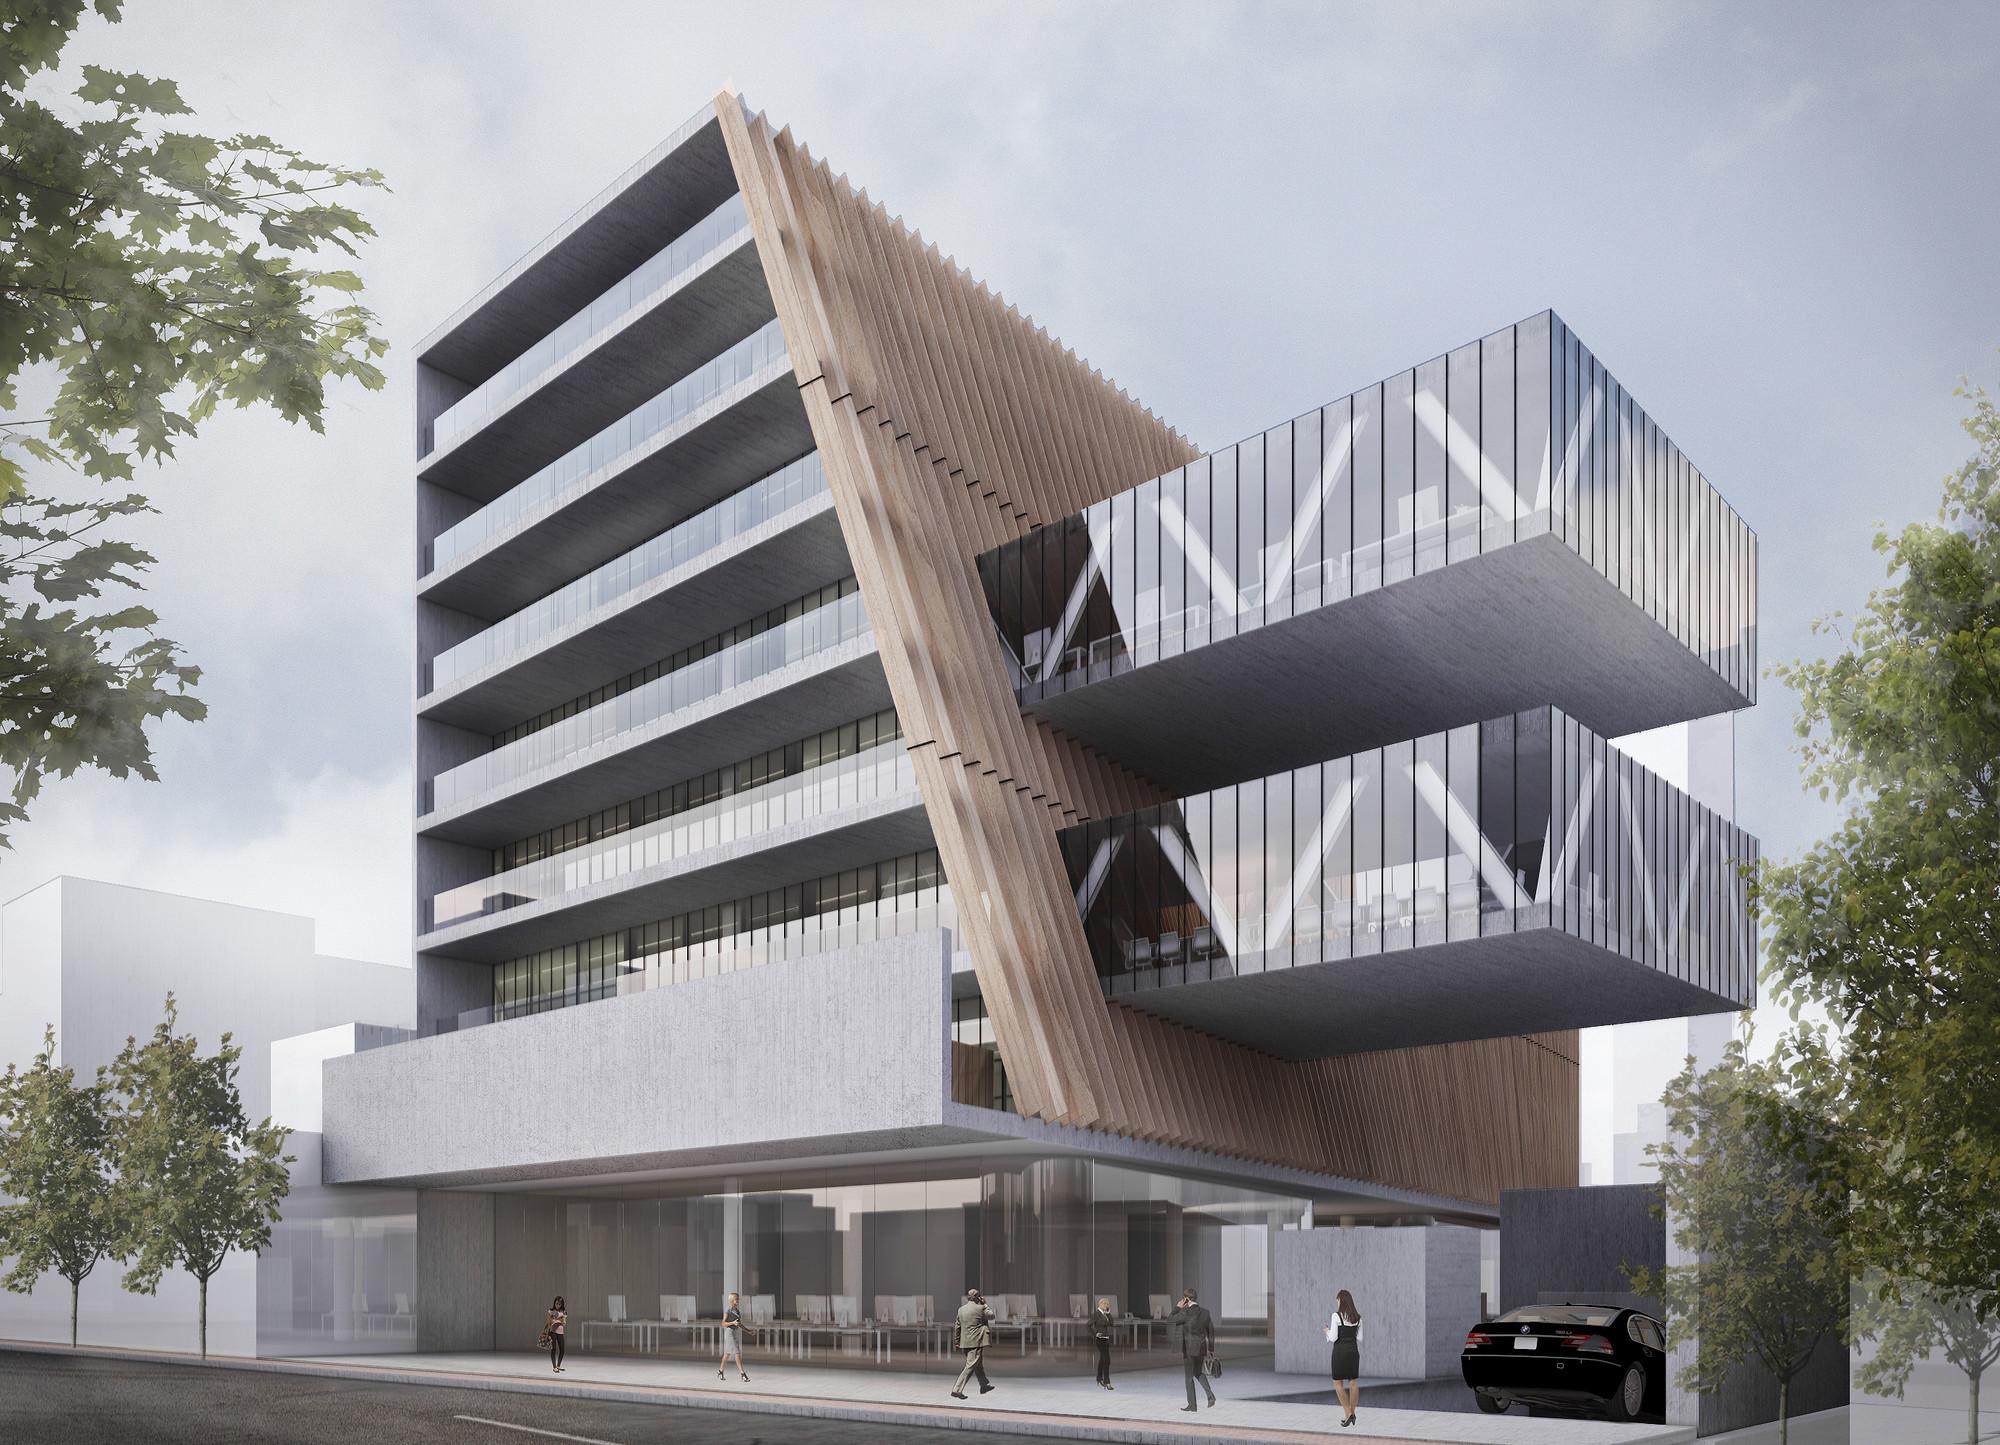 Proyecto Rio Tiber / Taller David Dana + Cherem Arquitectos, © Taller David Dana Arquitectura